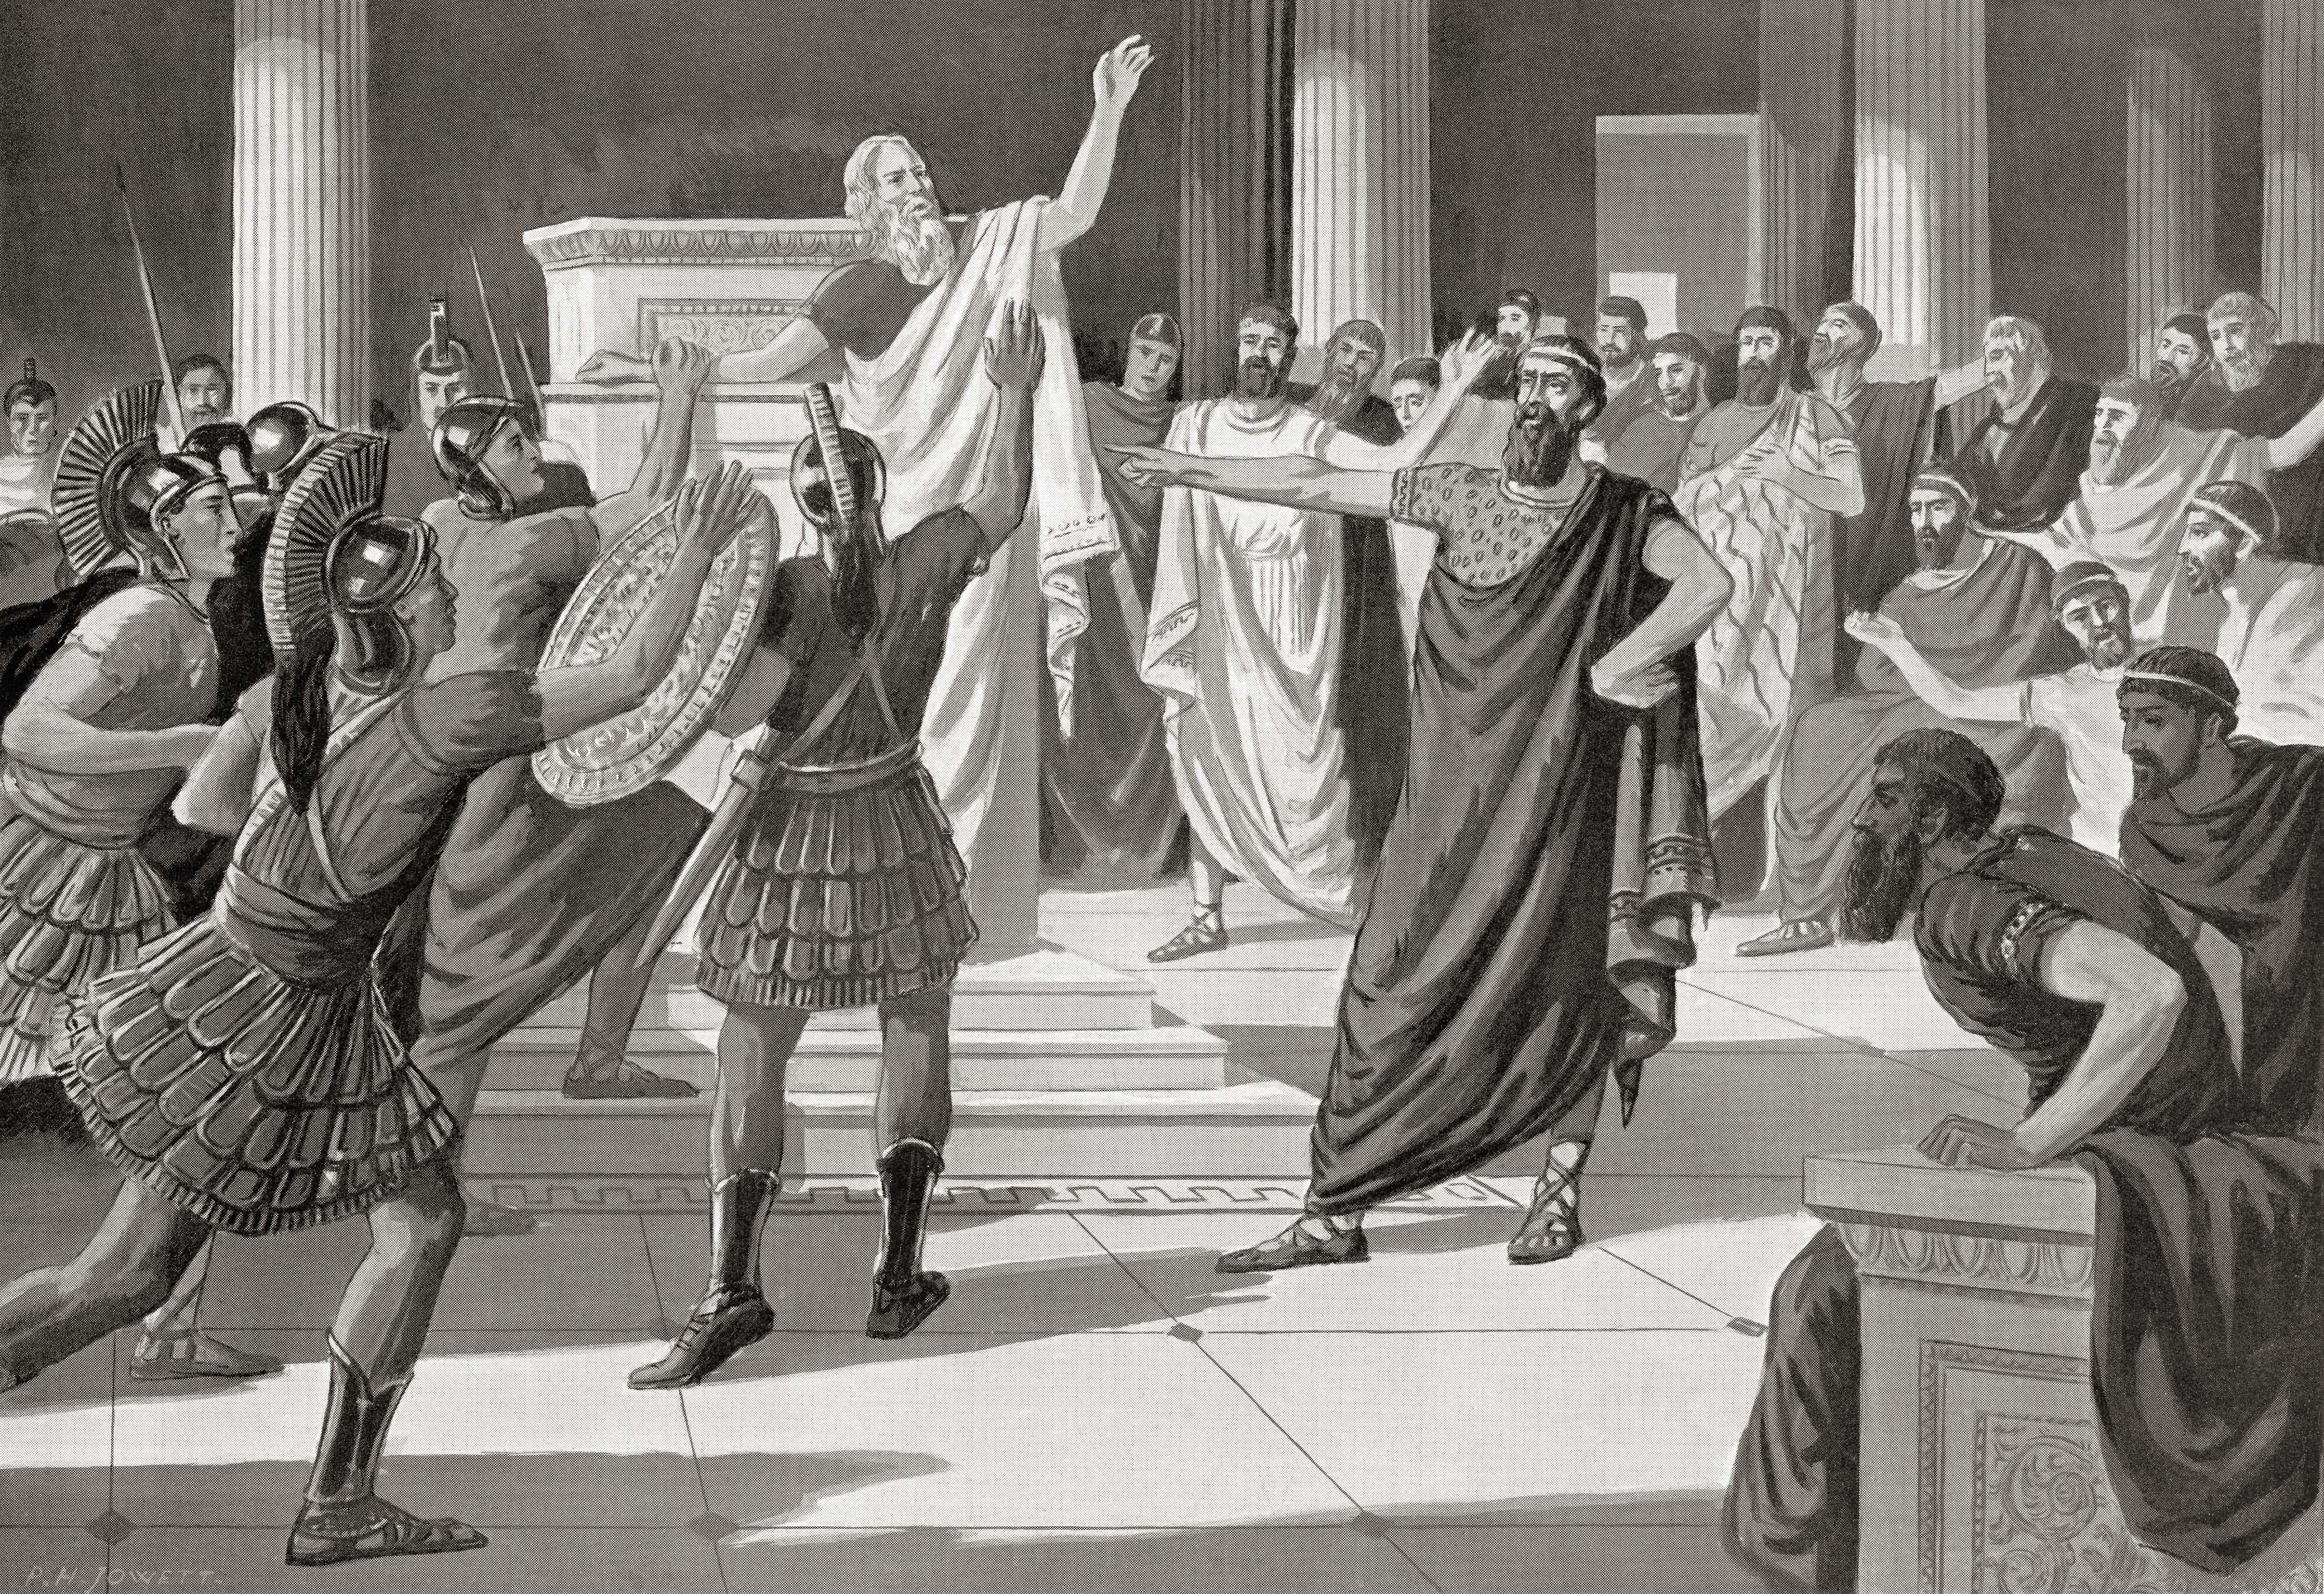 Critias ordering the execution of Theramenes.